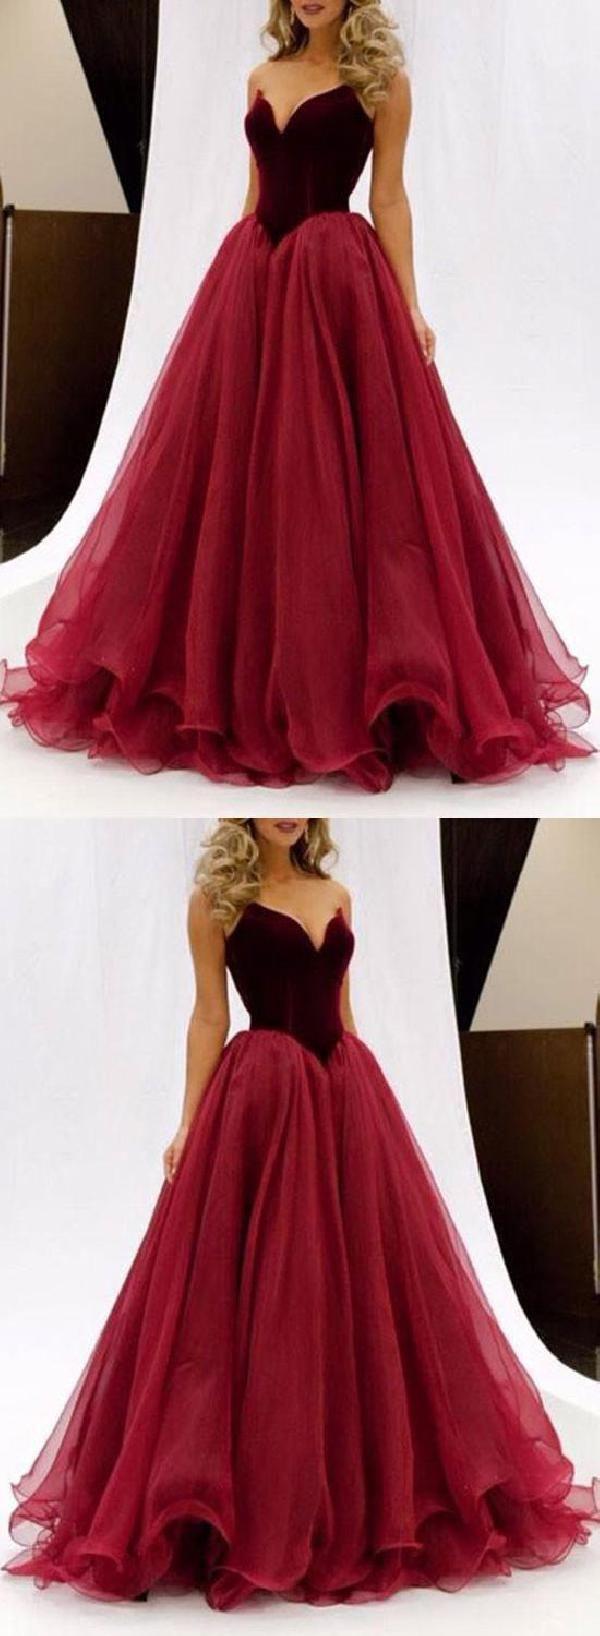 Long evening dress evening dress red prom dresses long prom dress